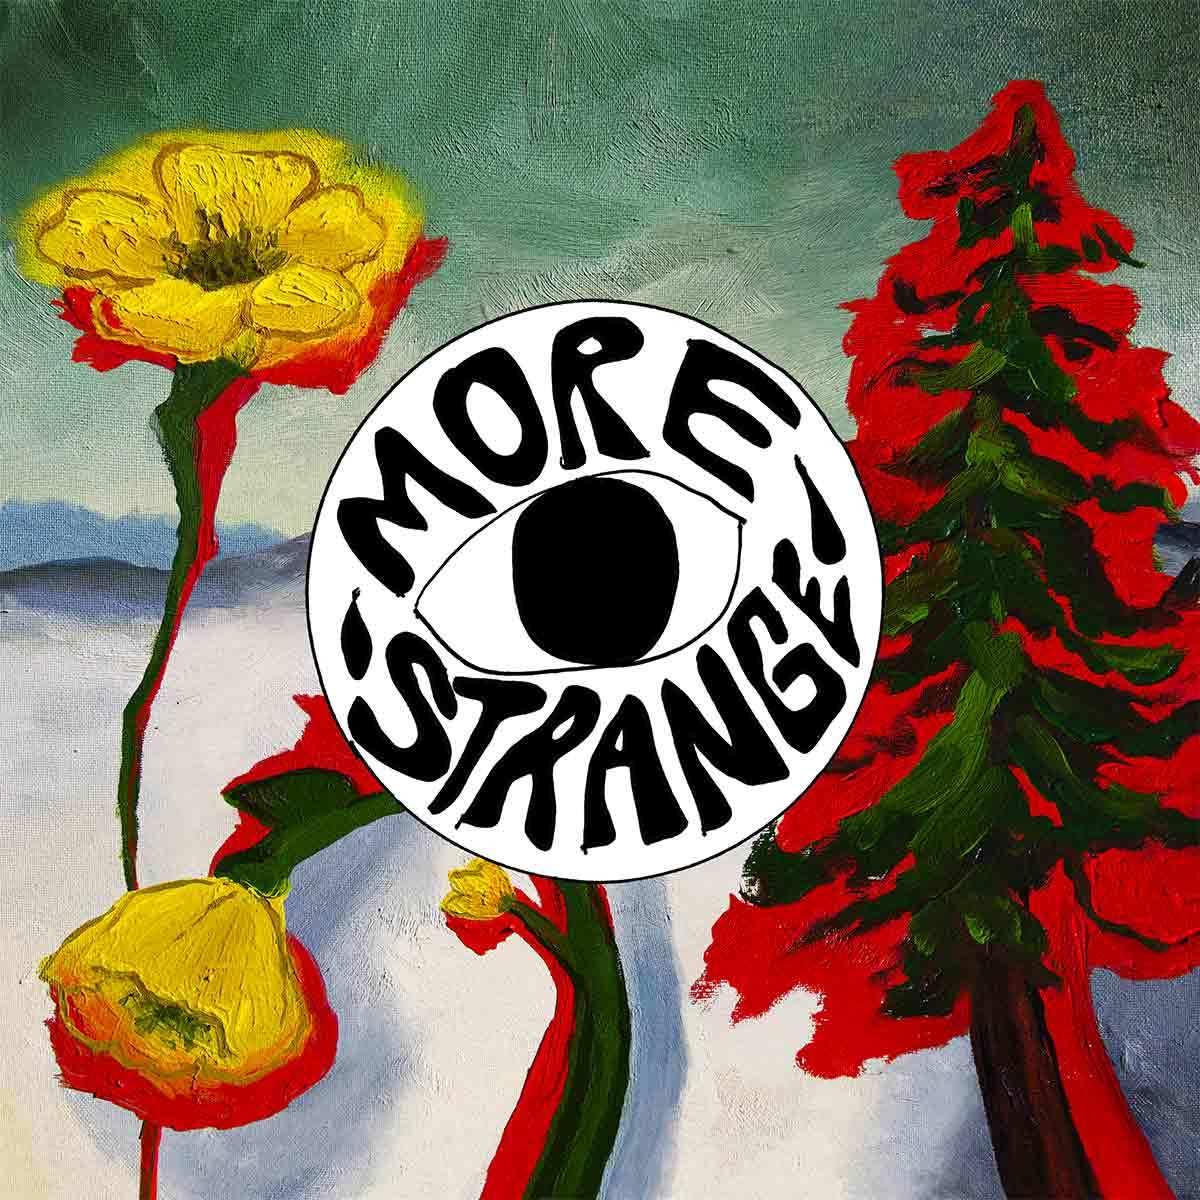 Tapa de More Strange, disco de Woods